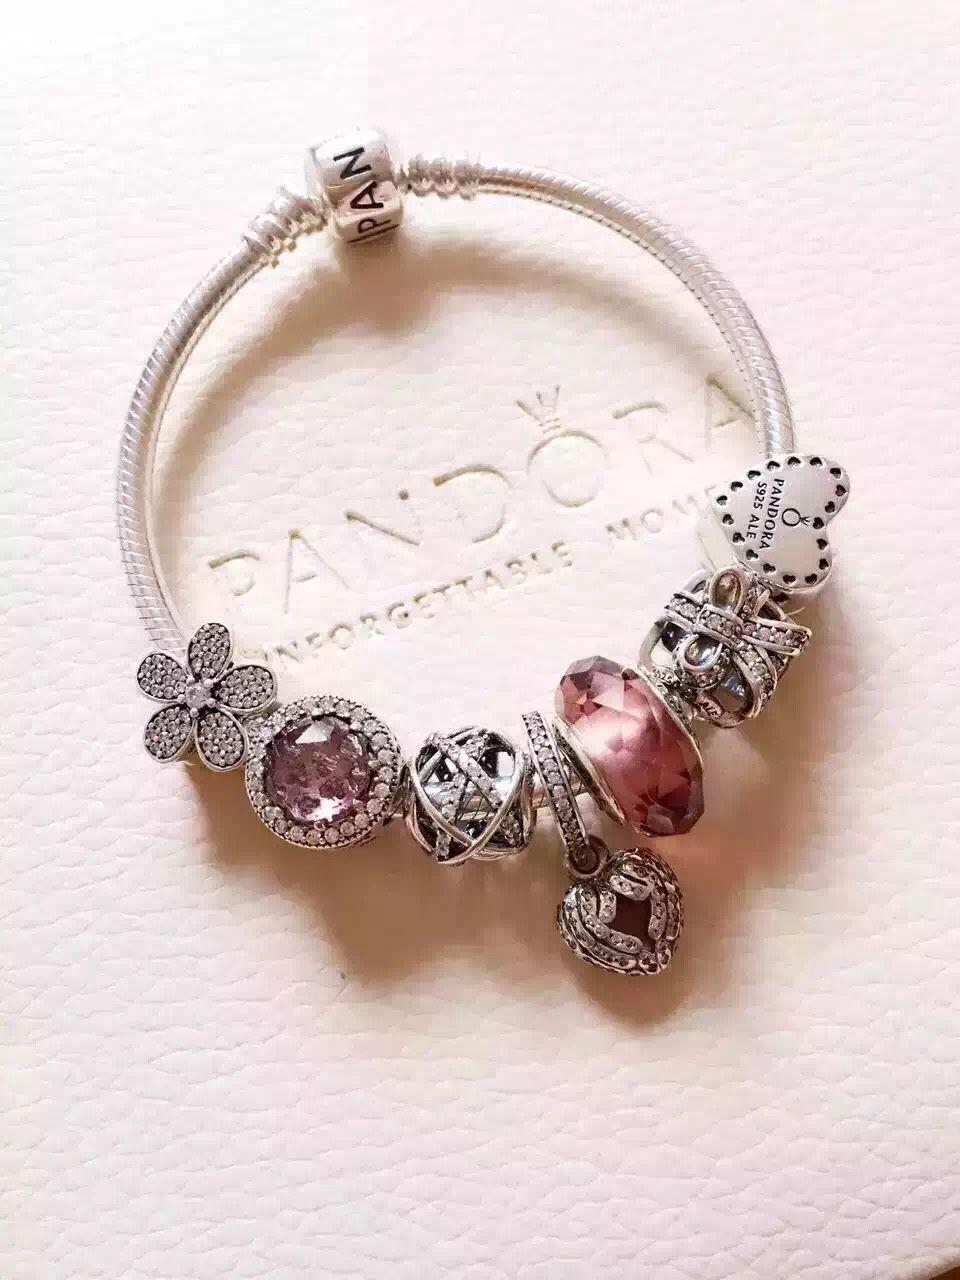 50 Off 199 Pandora Charm Bracelet Pink Hot Sale